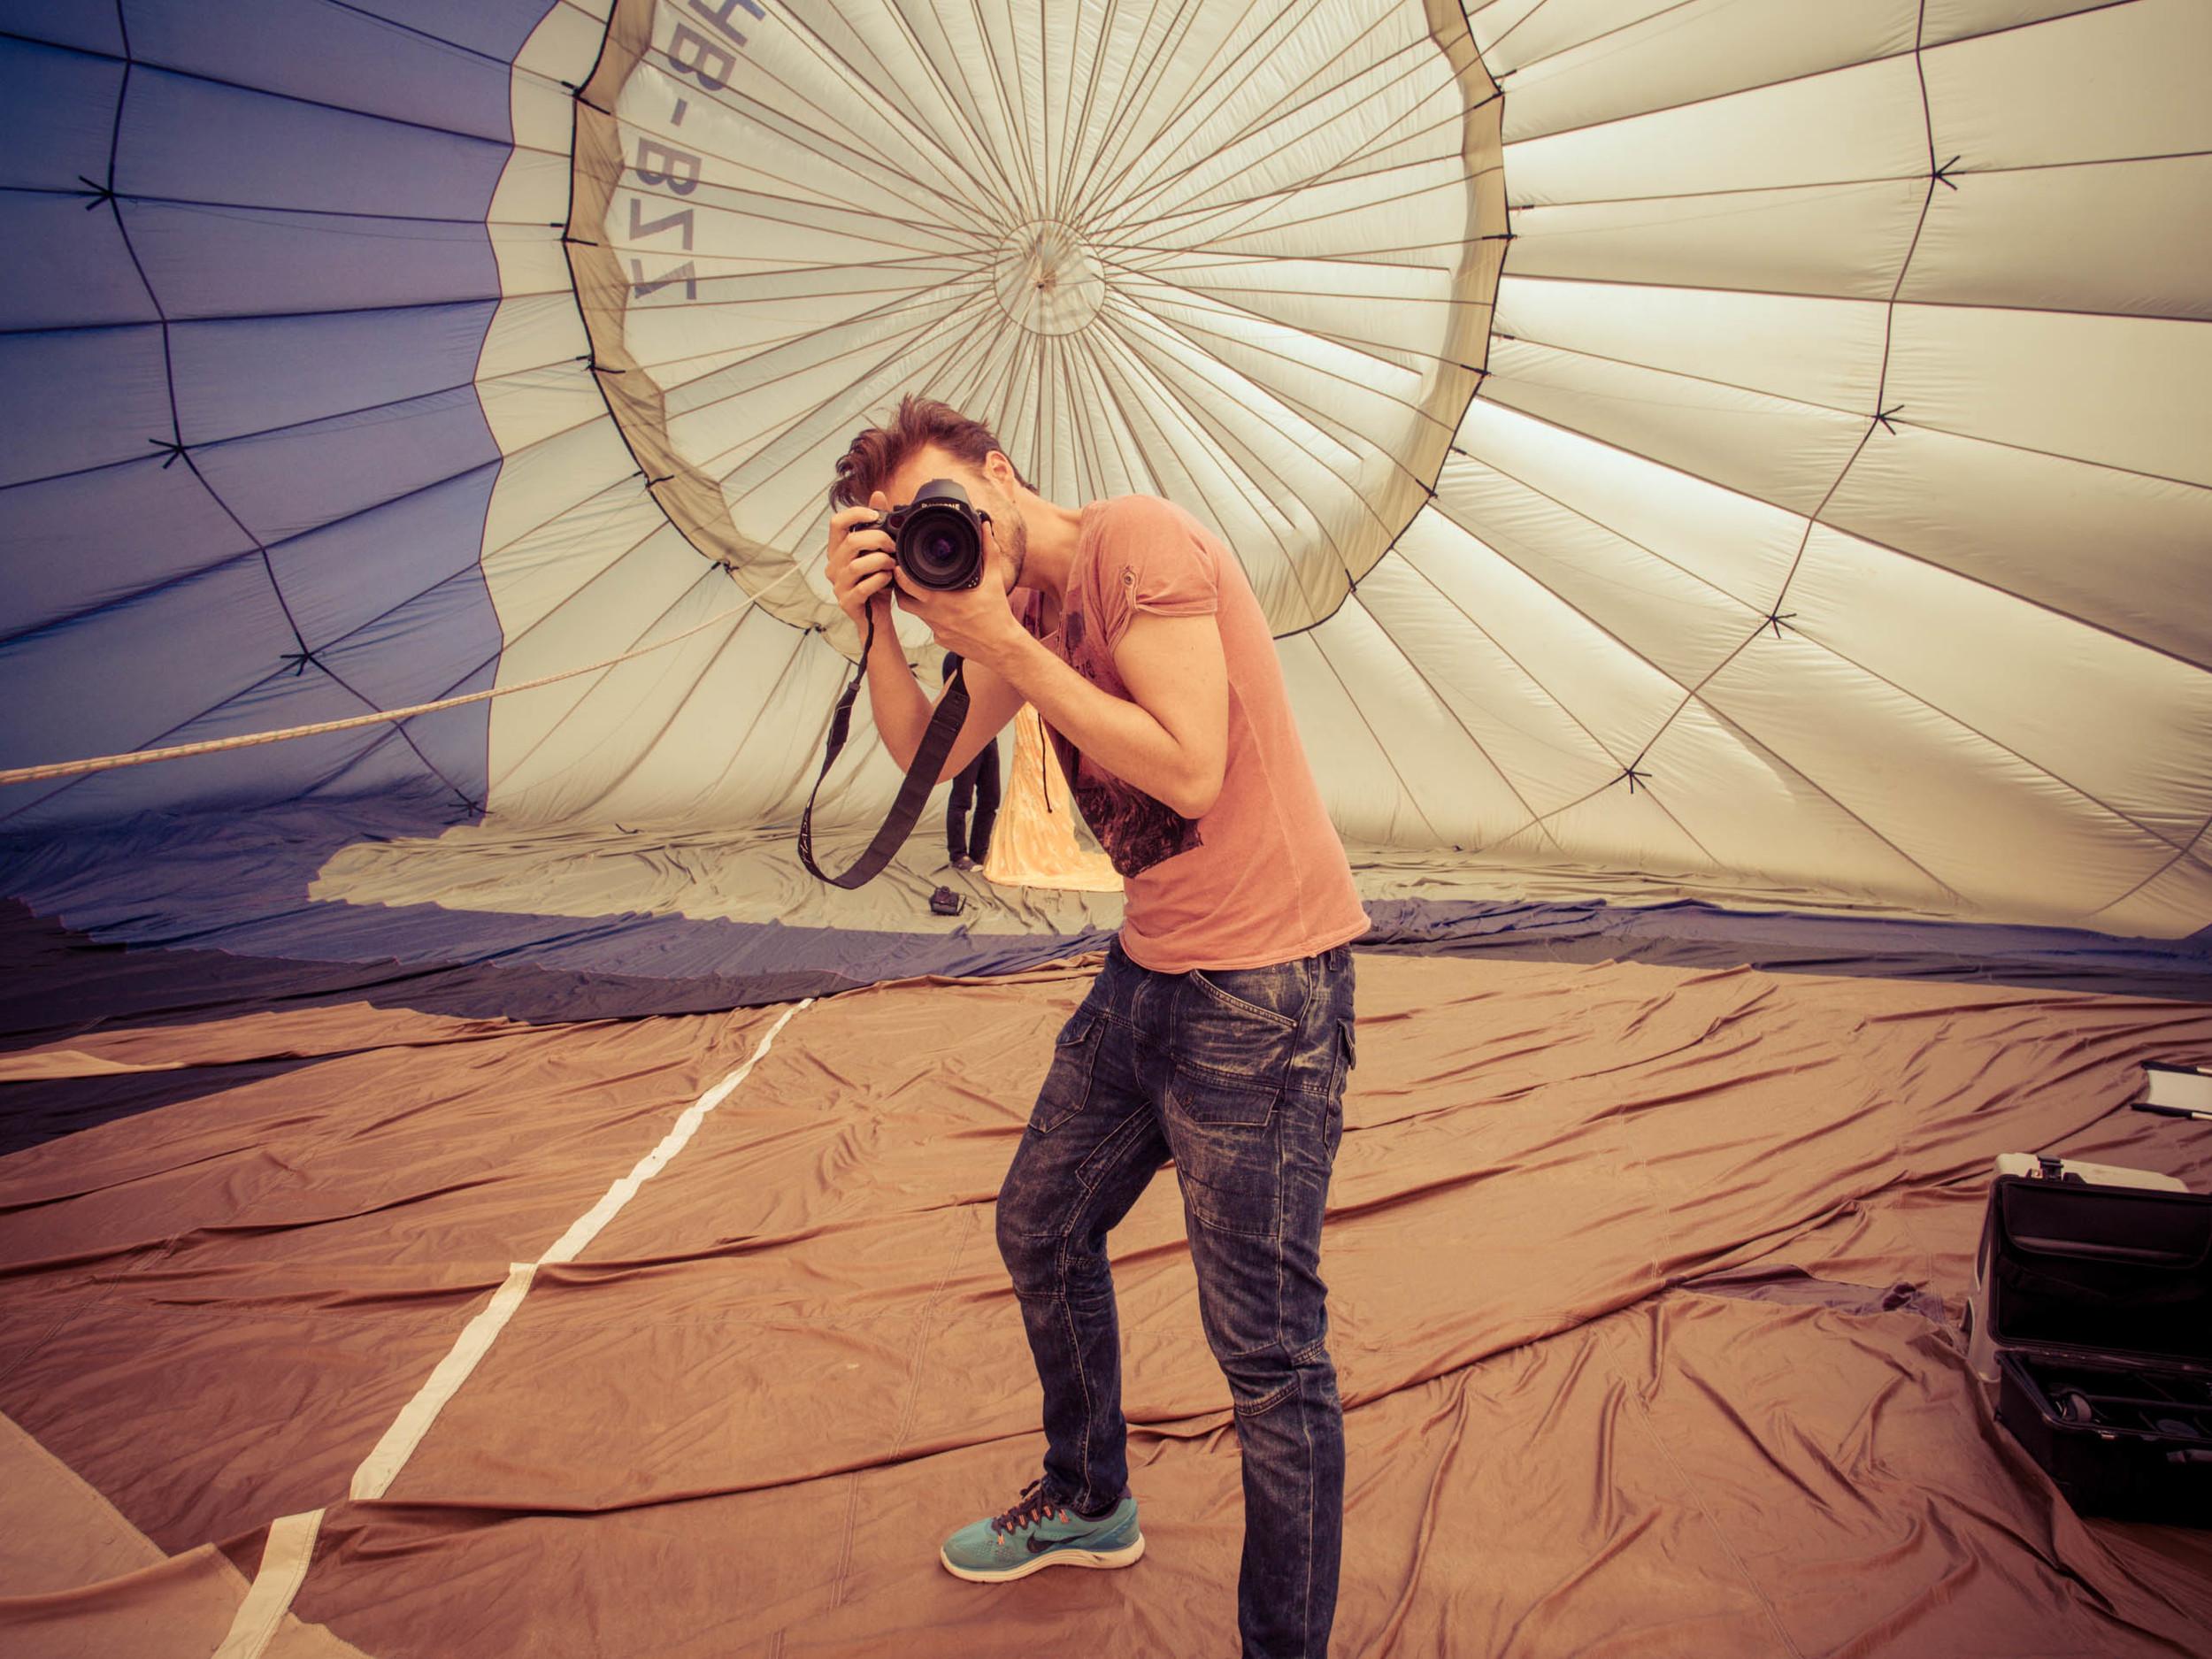 Heisslufballon_OMD-222.jpg